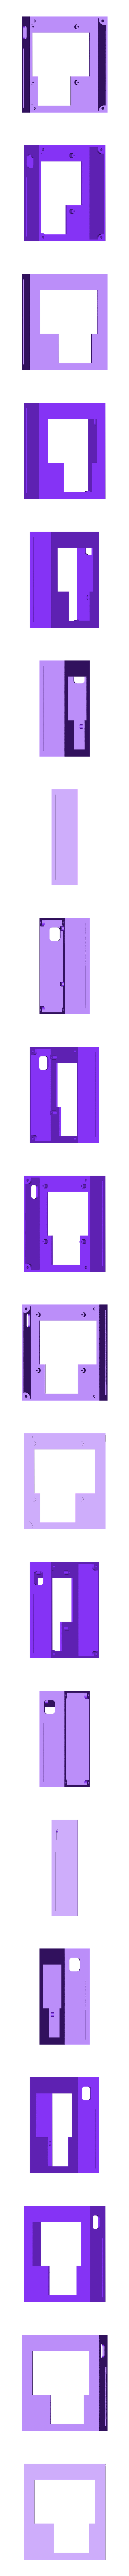 lower-level.stl Download free STL file Steampunk Oculus Roboticus • 3D print design, cyrusharding